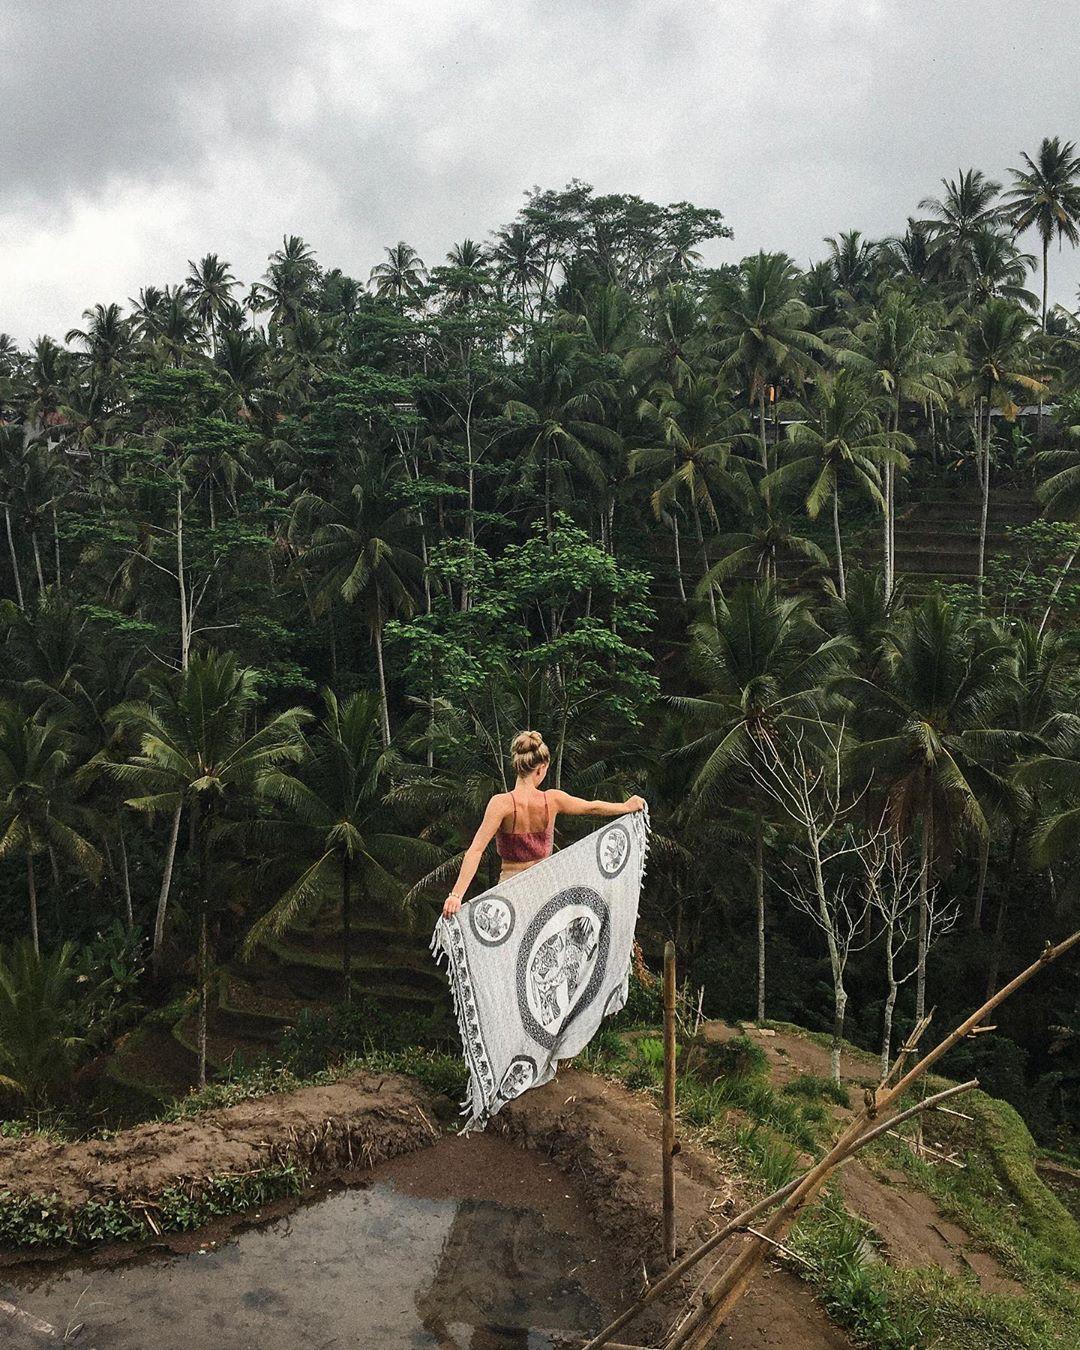 bali travel scams sarong